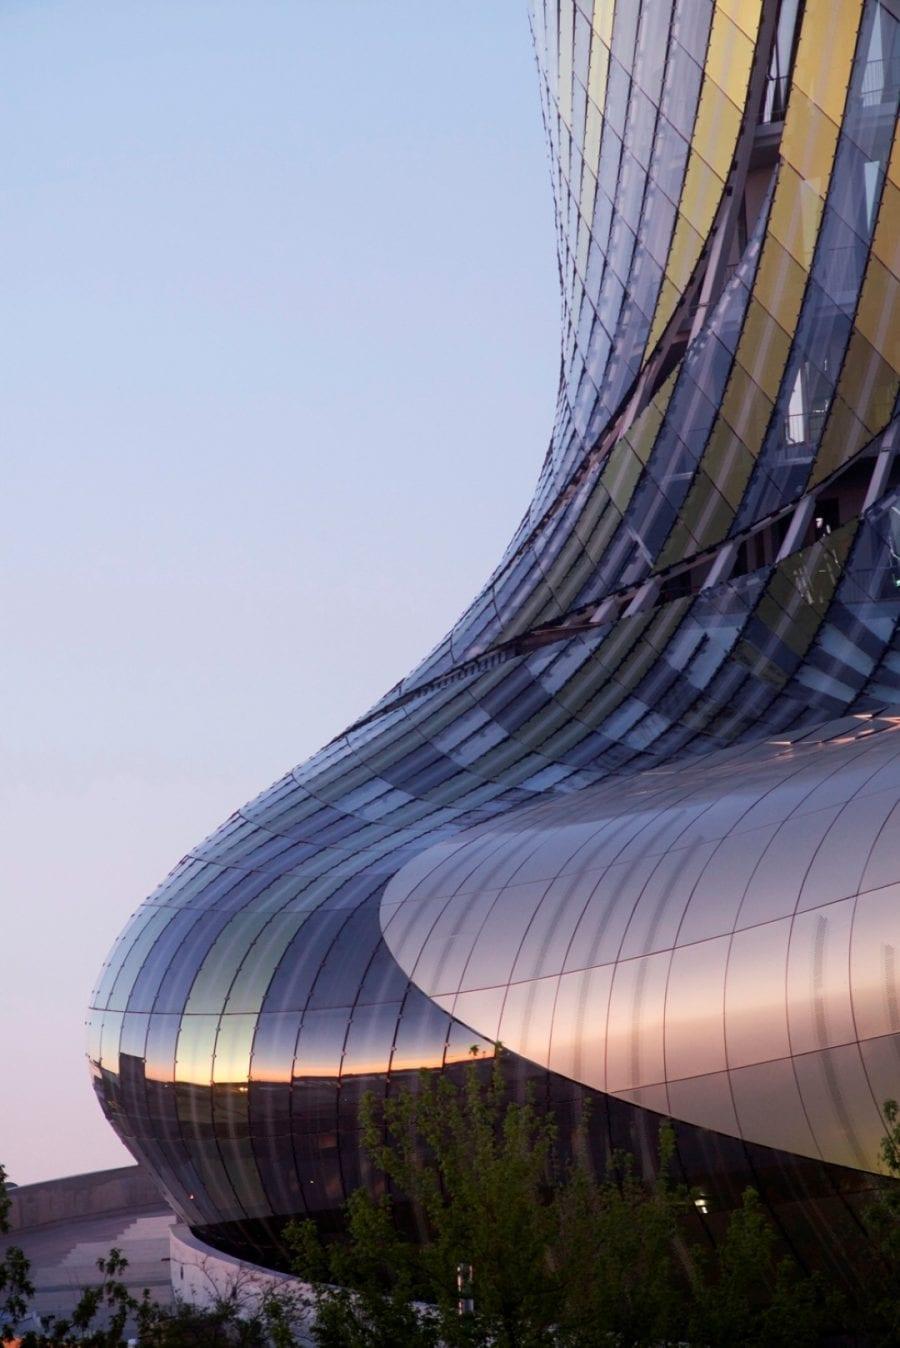 """Cité du vin"" una experiencia arquitectónica única 25"